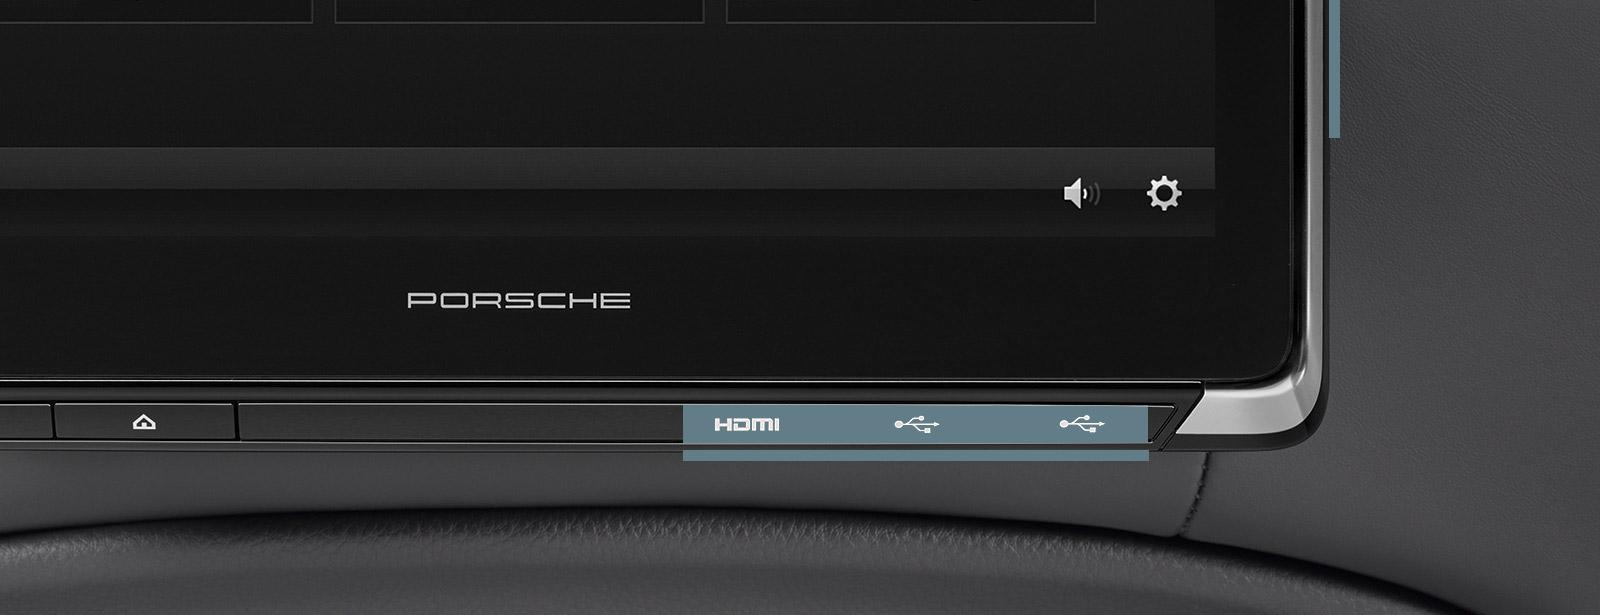 porsche rear seat entertainment porsche usa. Black Bedroom Furniture Sets. Home Design Ideas